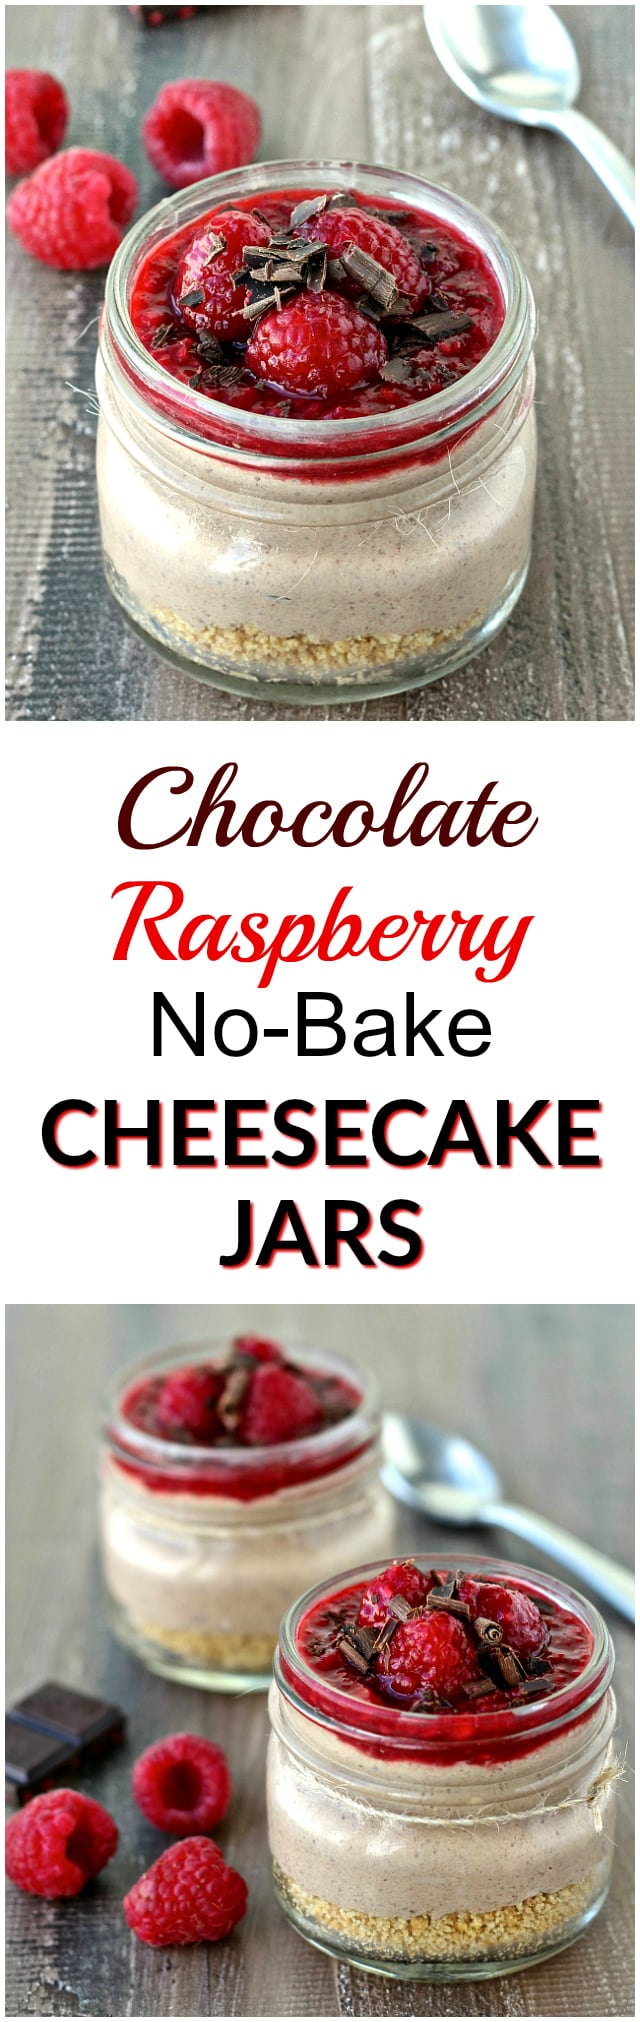 ChocolateRaspberry No-Bake Cheesecake Jars | @foodiephysician